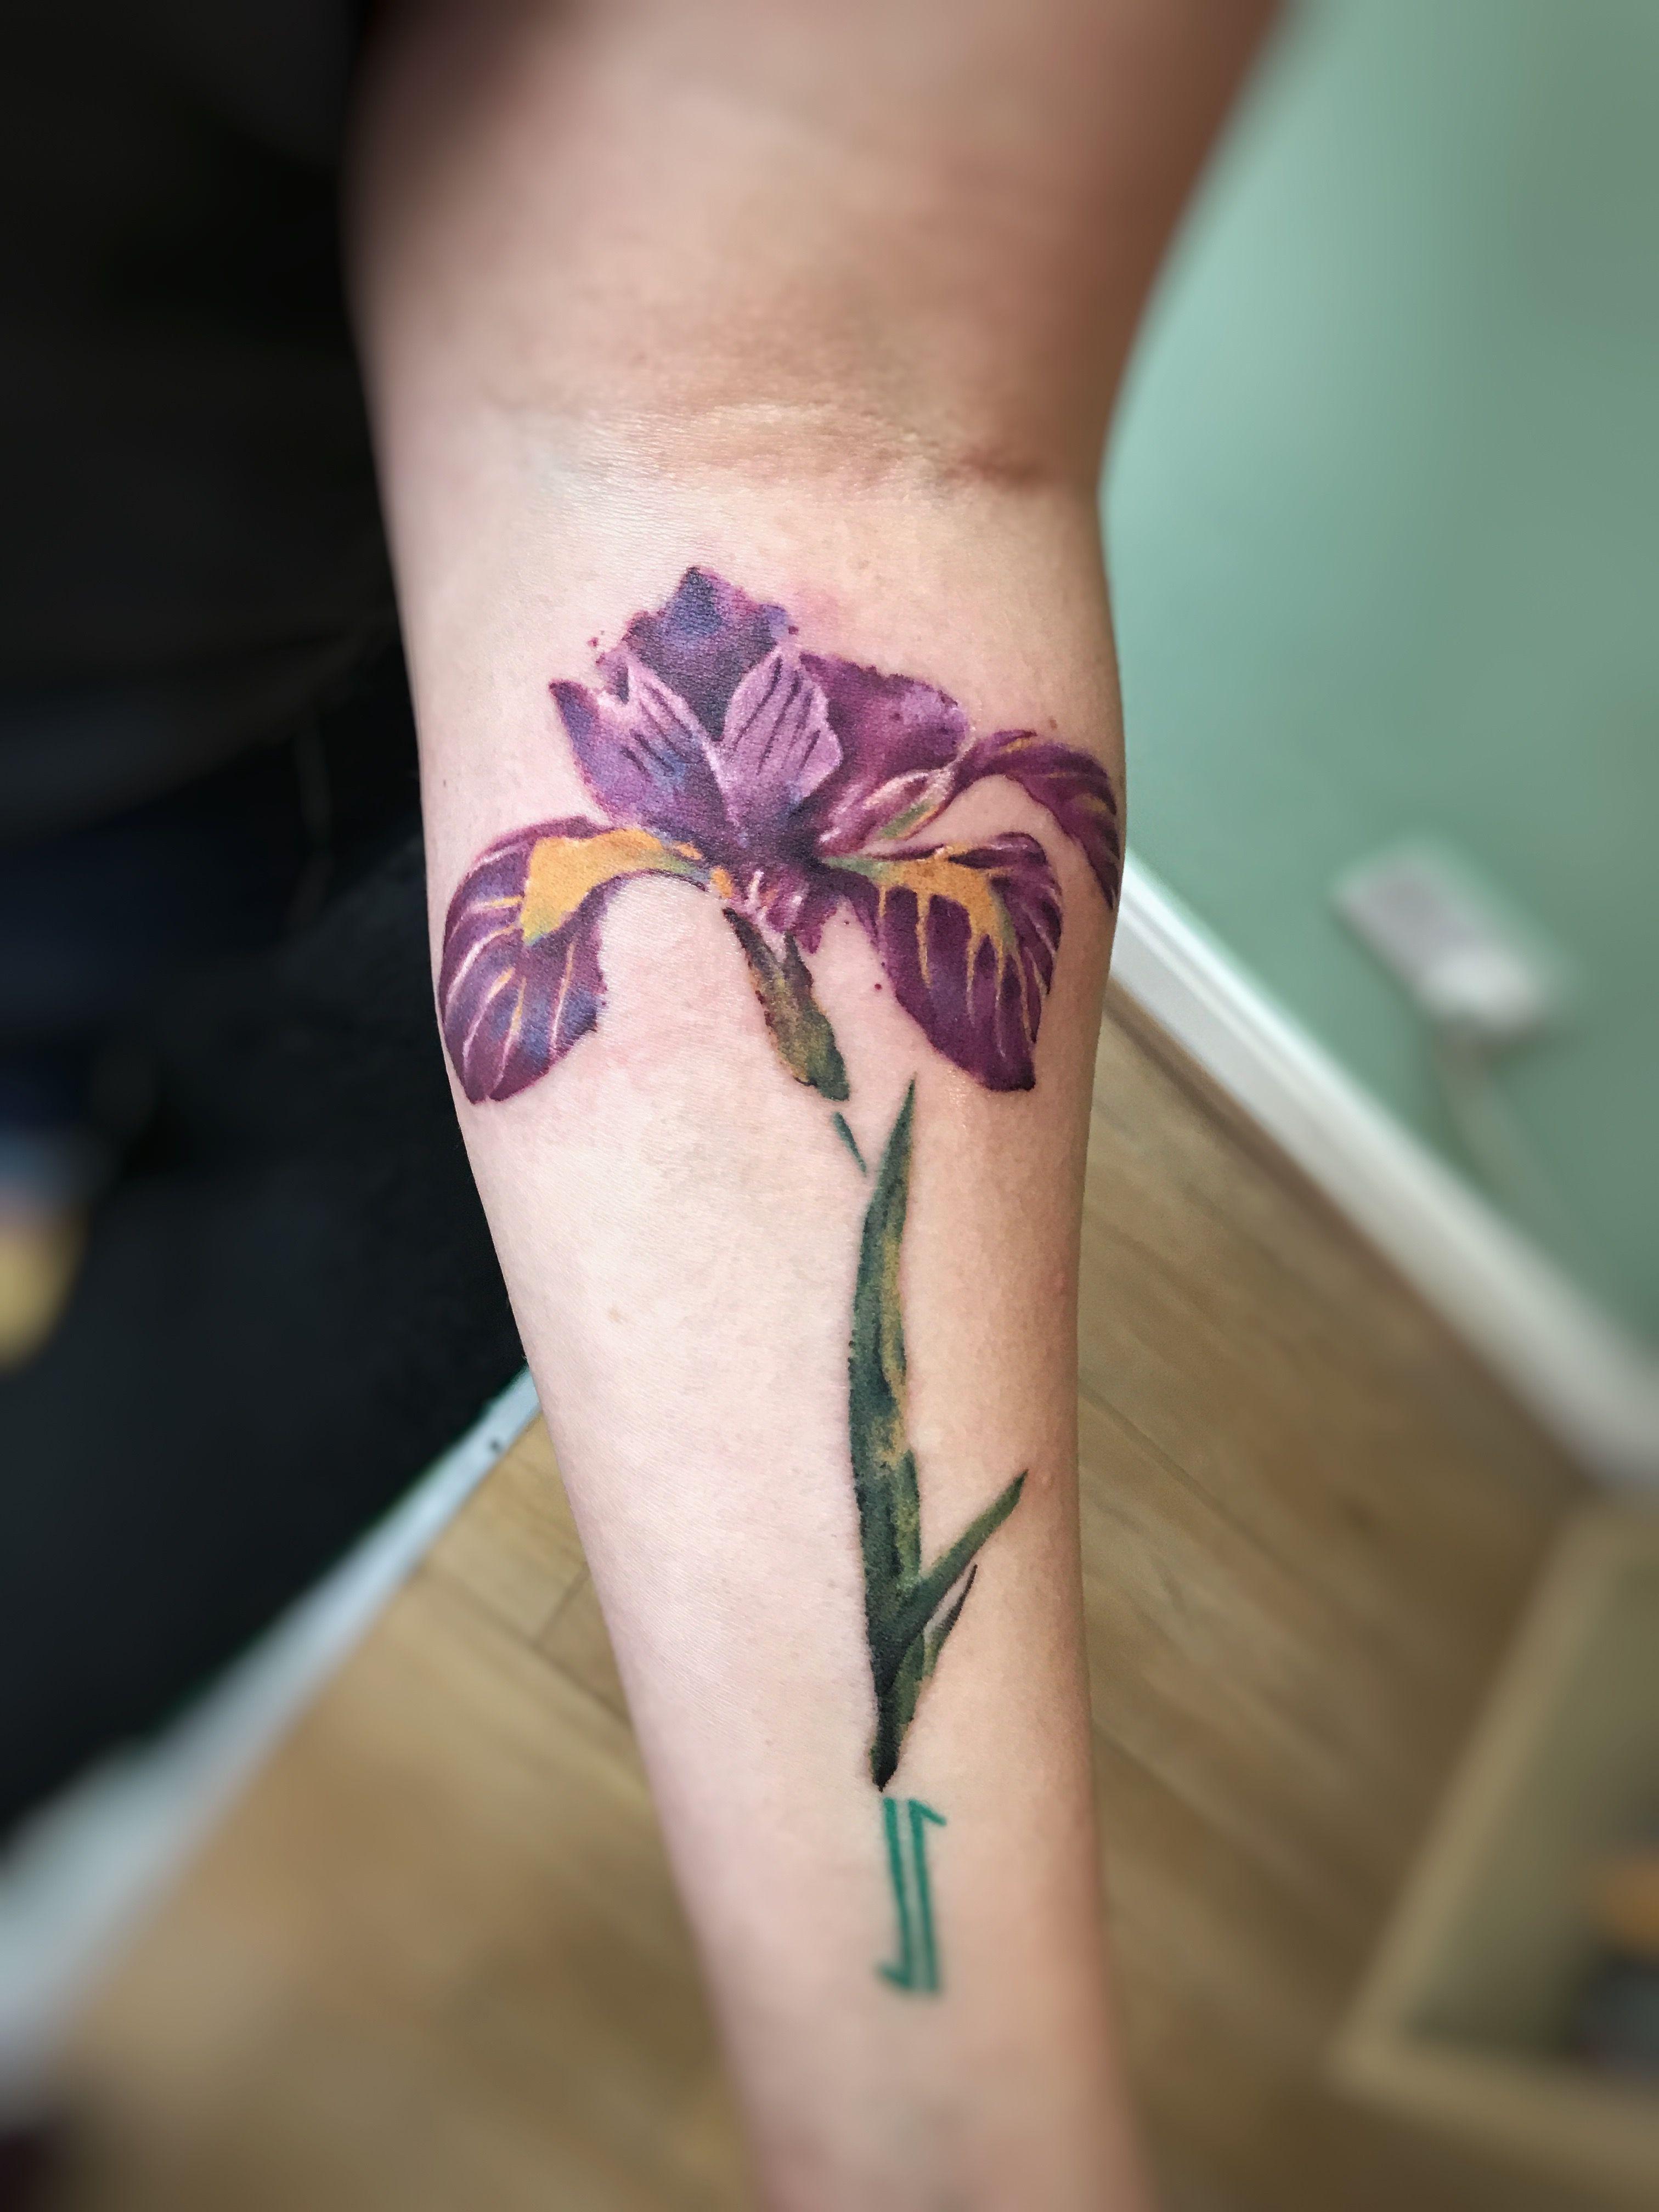 Watercolor iris flower tattoo done by yuki zerkjad yuki zerkjad watercolor iris flower tattoo done by yuki zerkjad izmirmasajfo